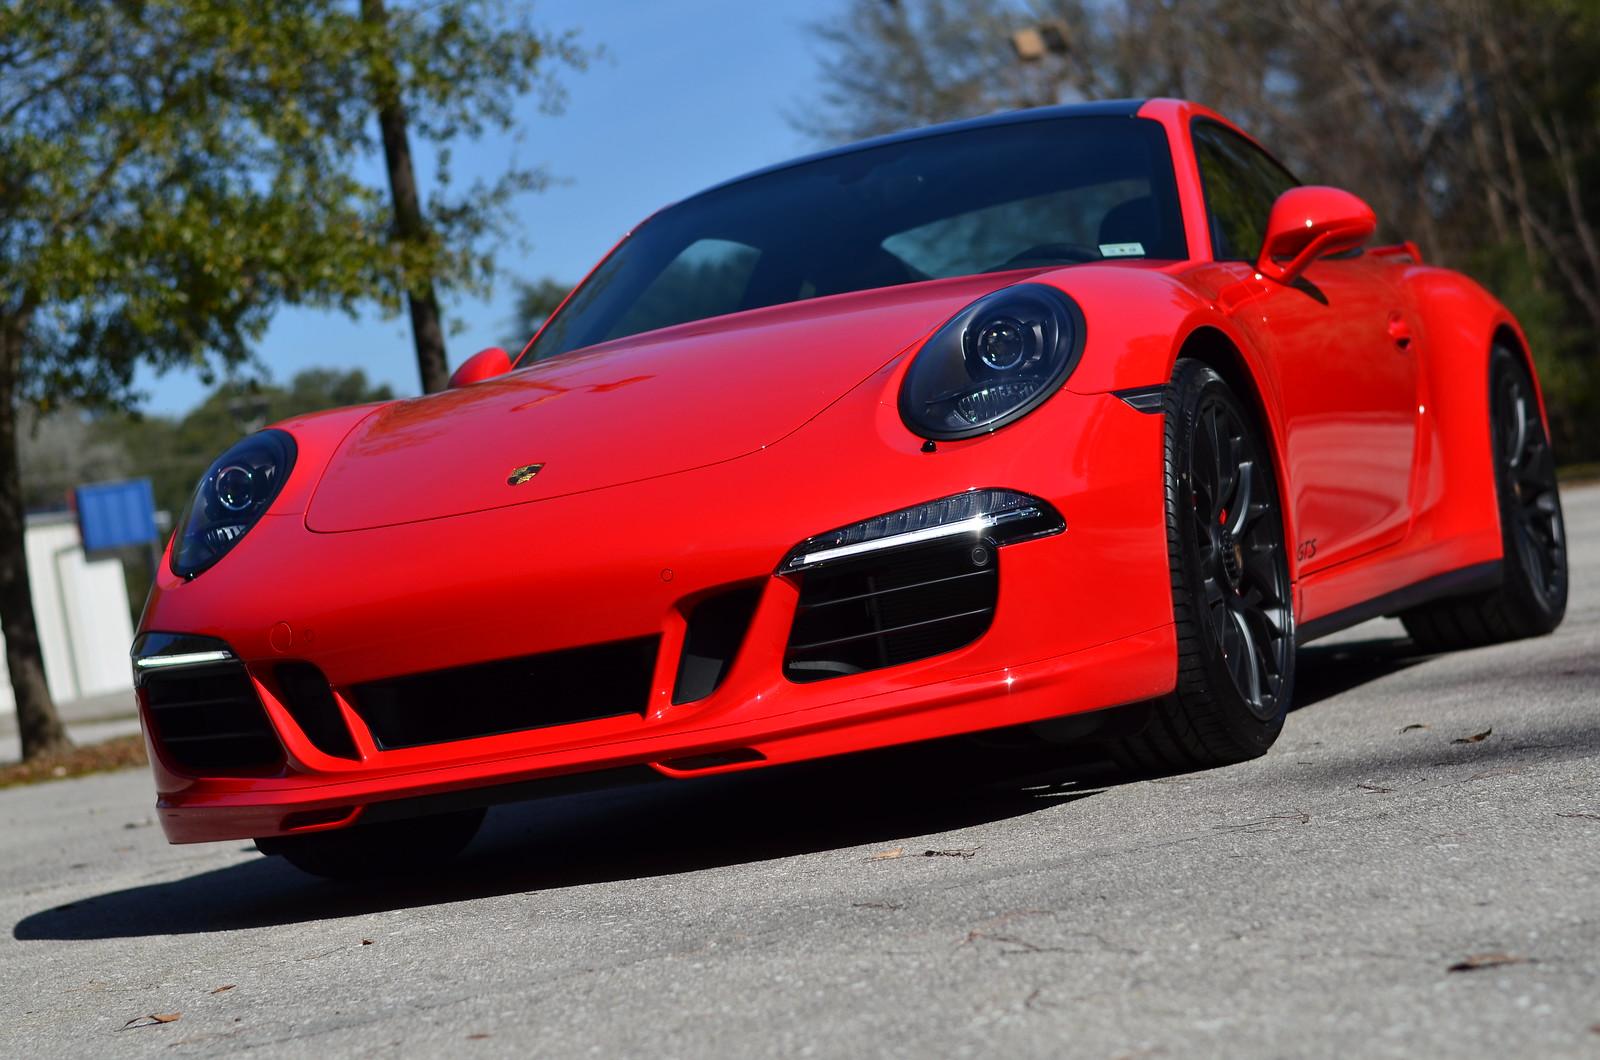 2015 911 Gts Coupe New Aerokit Cup Porsche Dealer In Fl Guards Red Rennlist Porsche